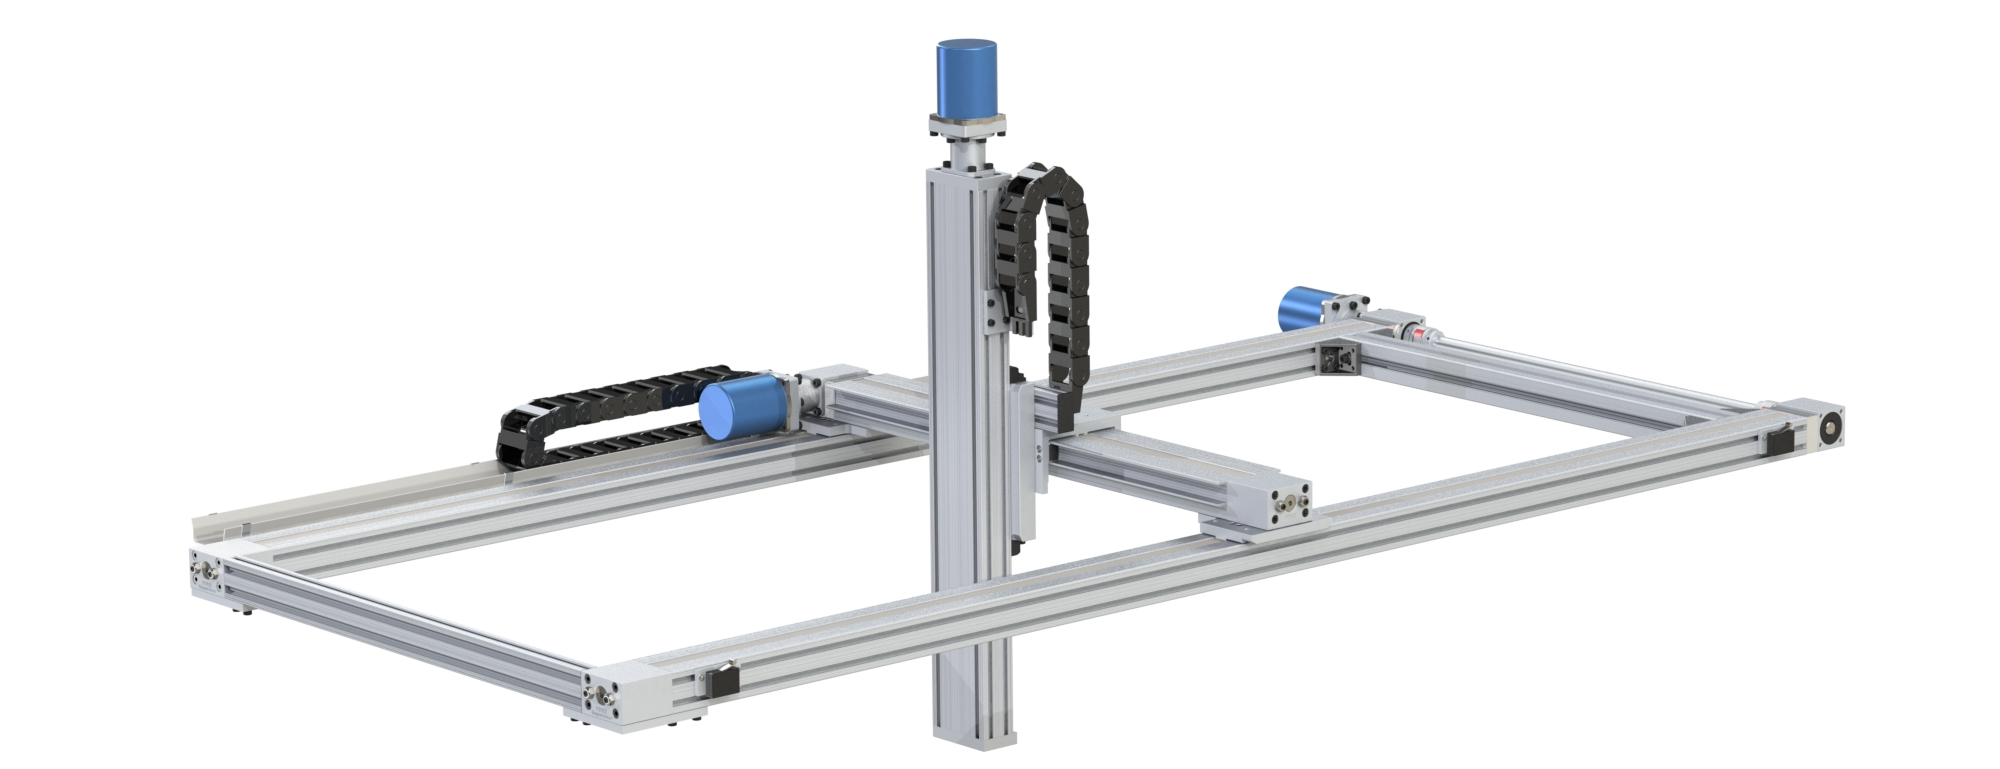 Cartesian XYZ Gantries - HepcoAutomation